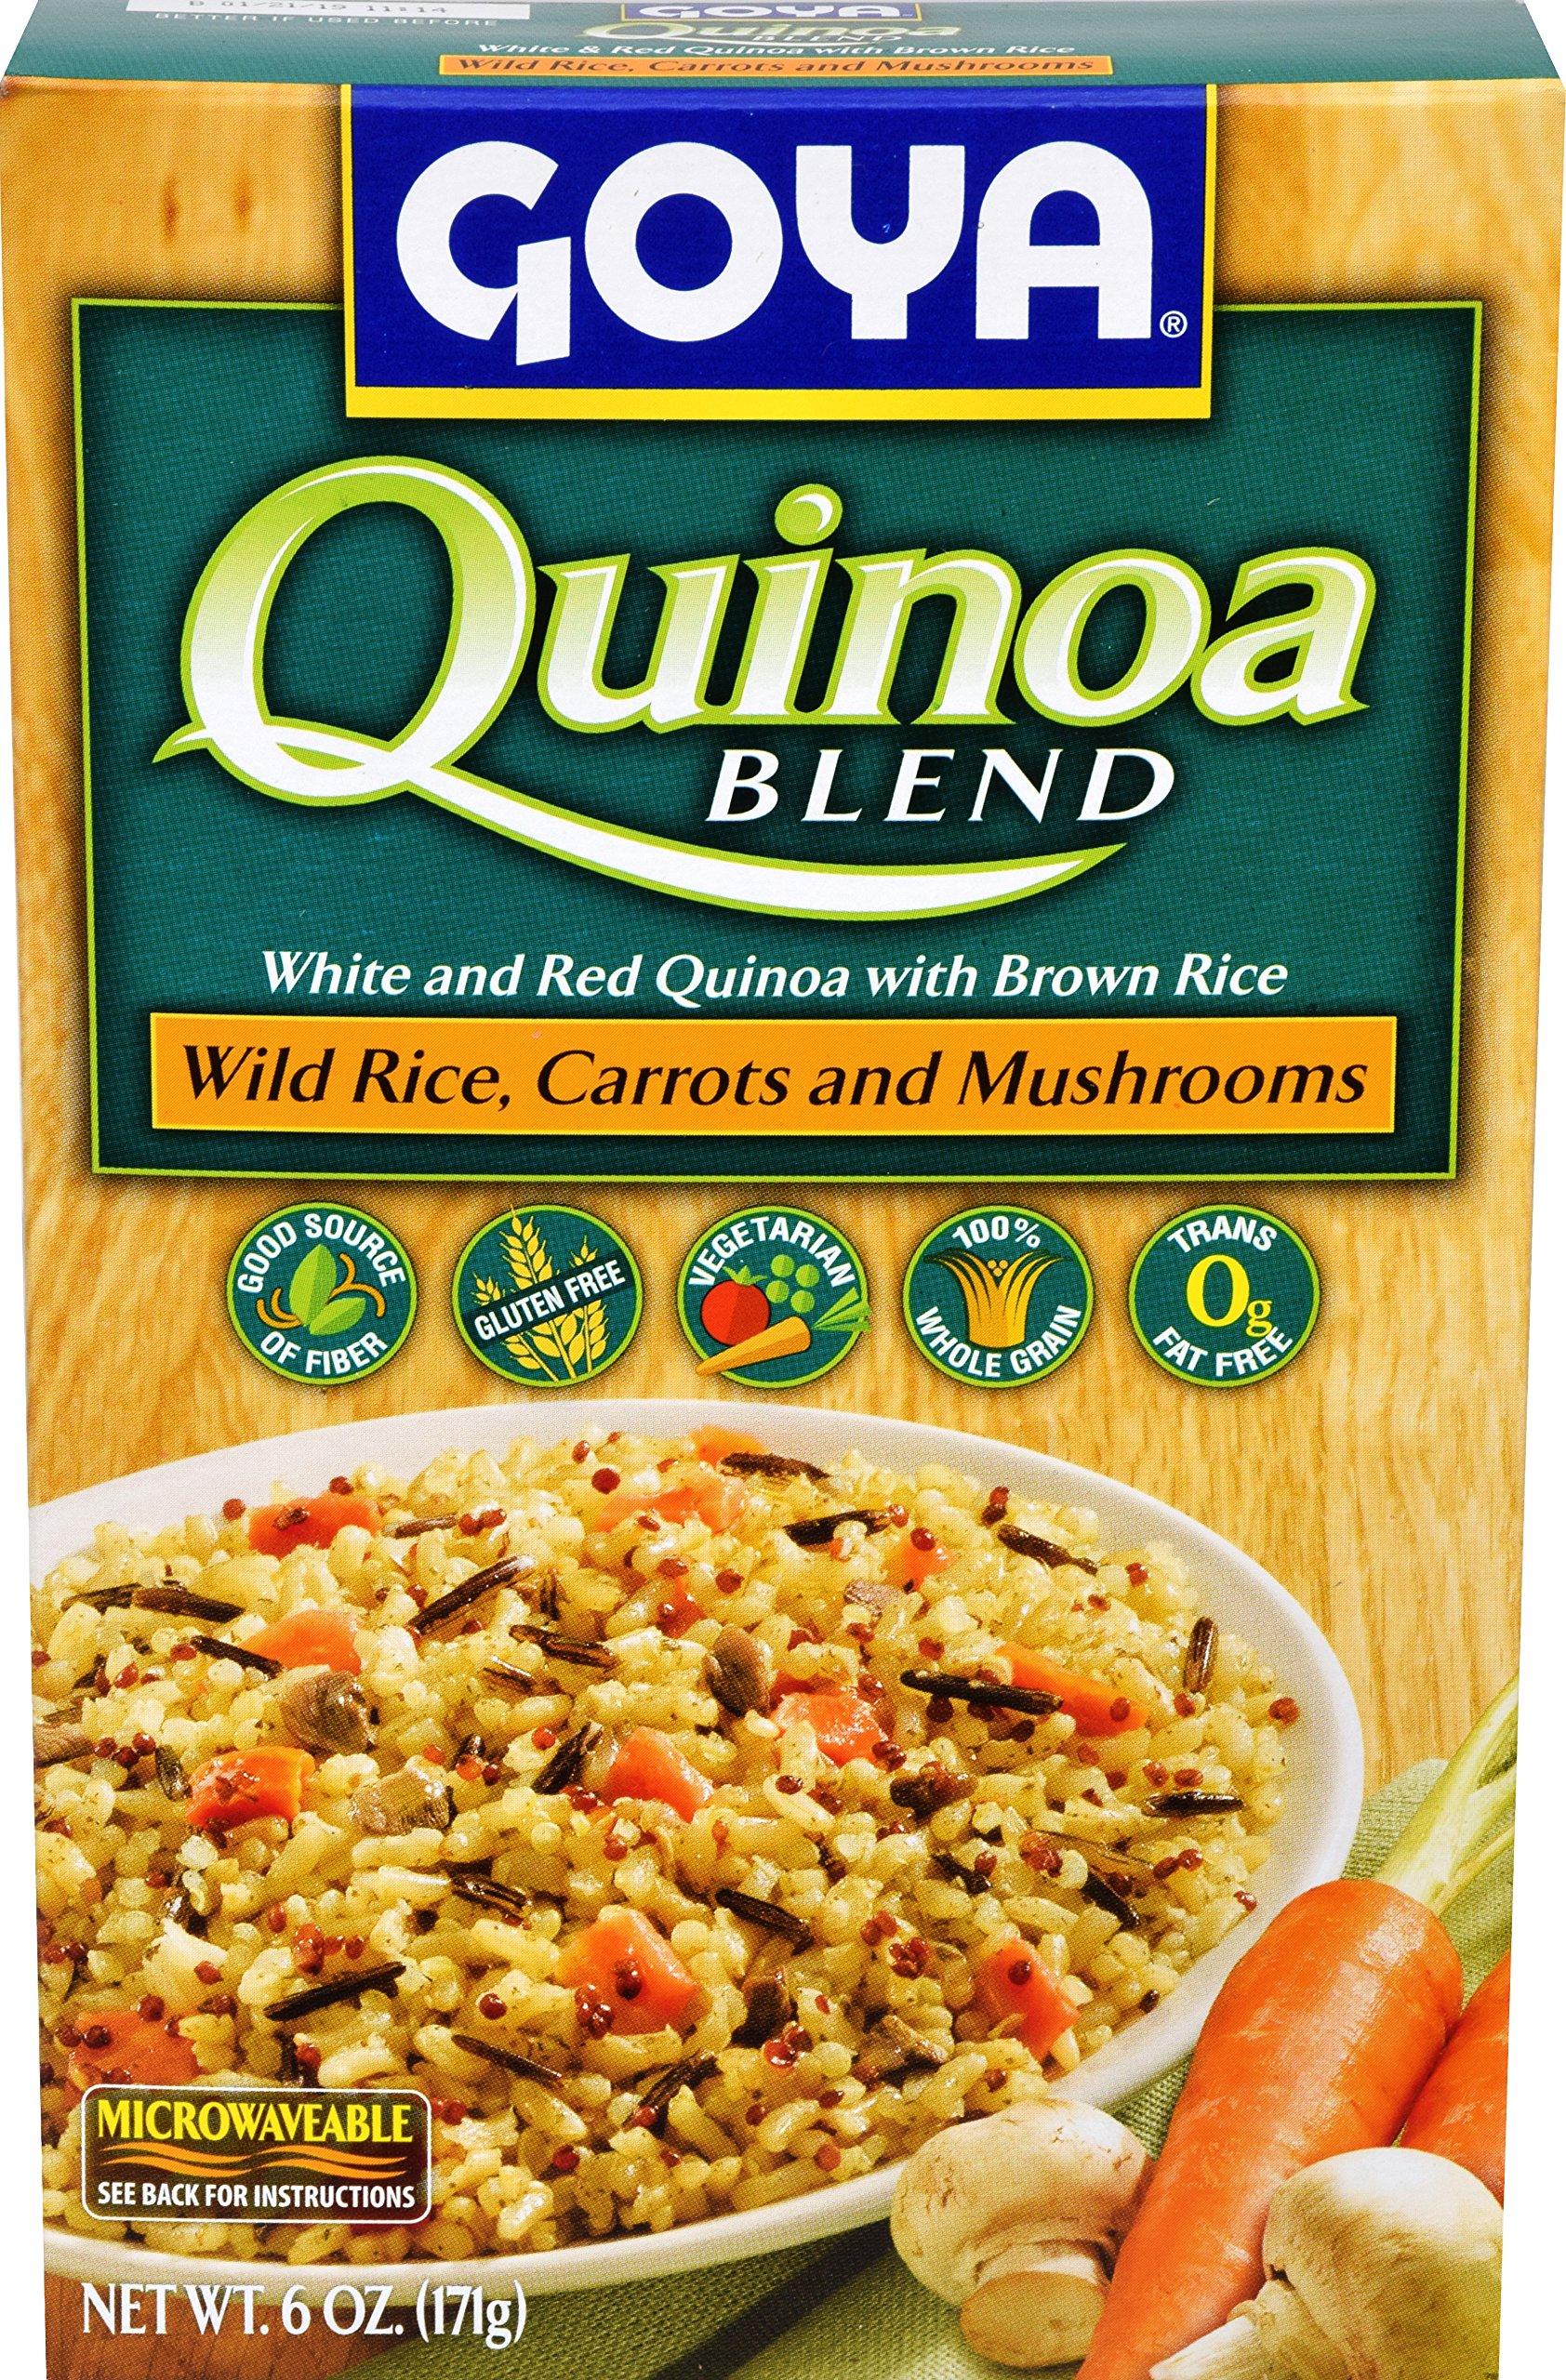 Goya Quinoa Blend Wild Rice, Carrots & Mushrooms, 6 oz by Goya